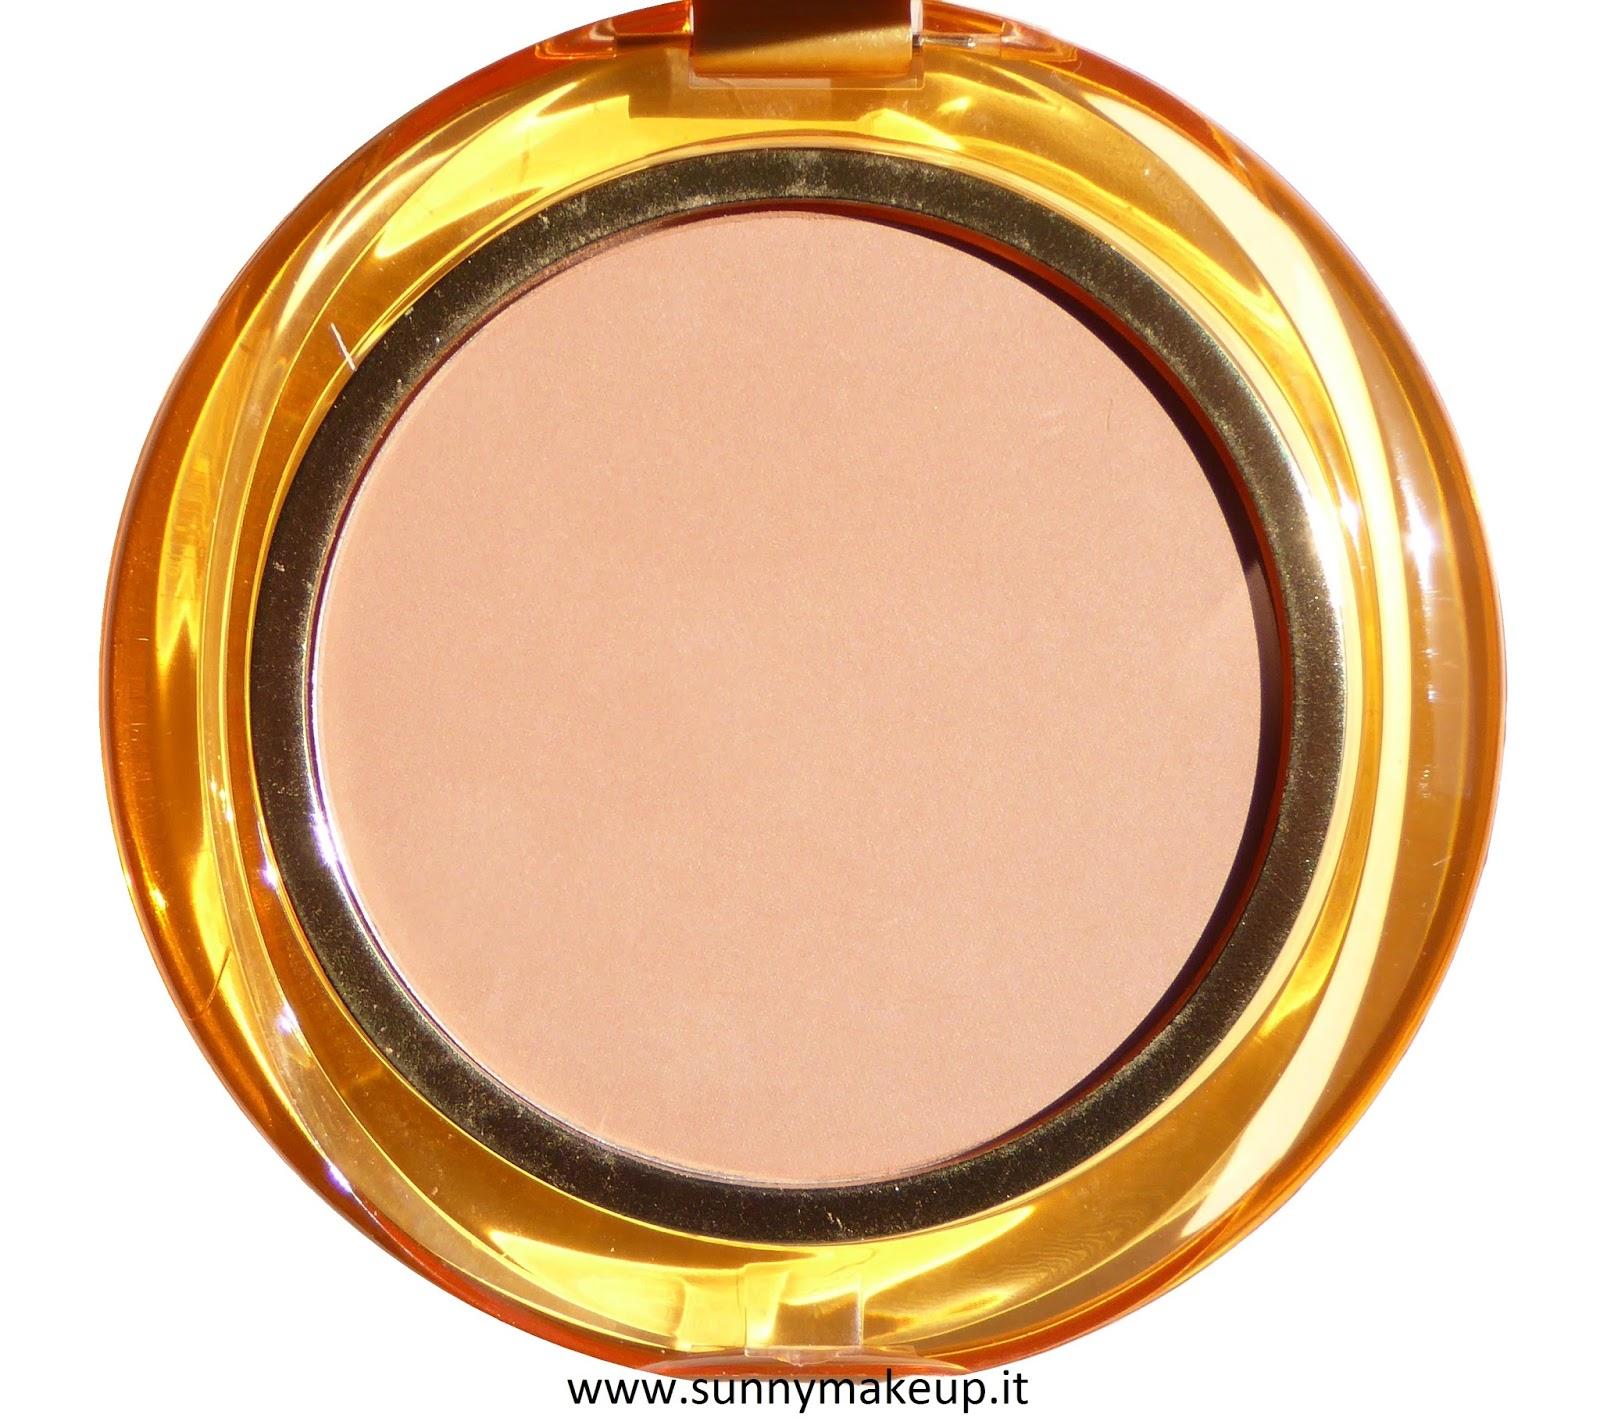 Pupa - Extreme Bronze. Terra abbronzante. 001 Honey.